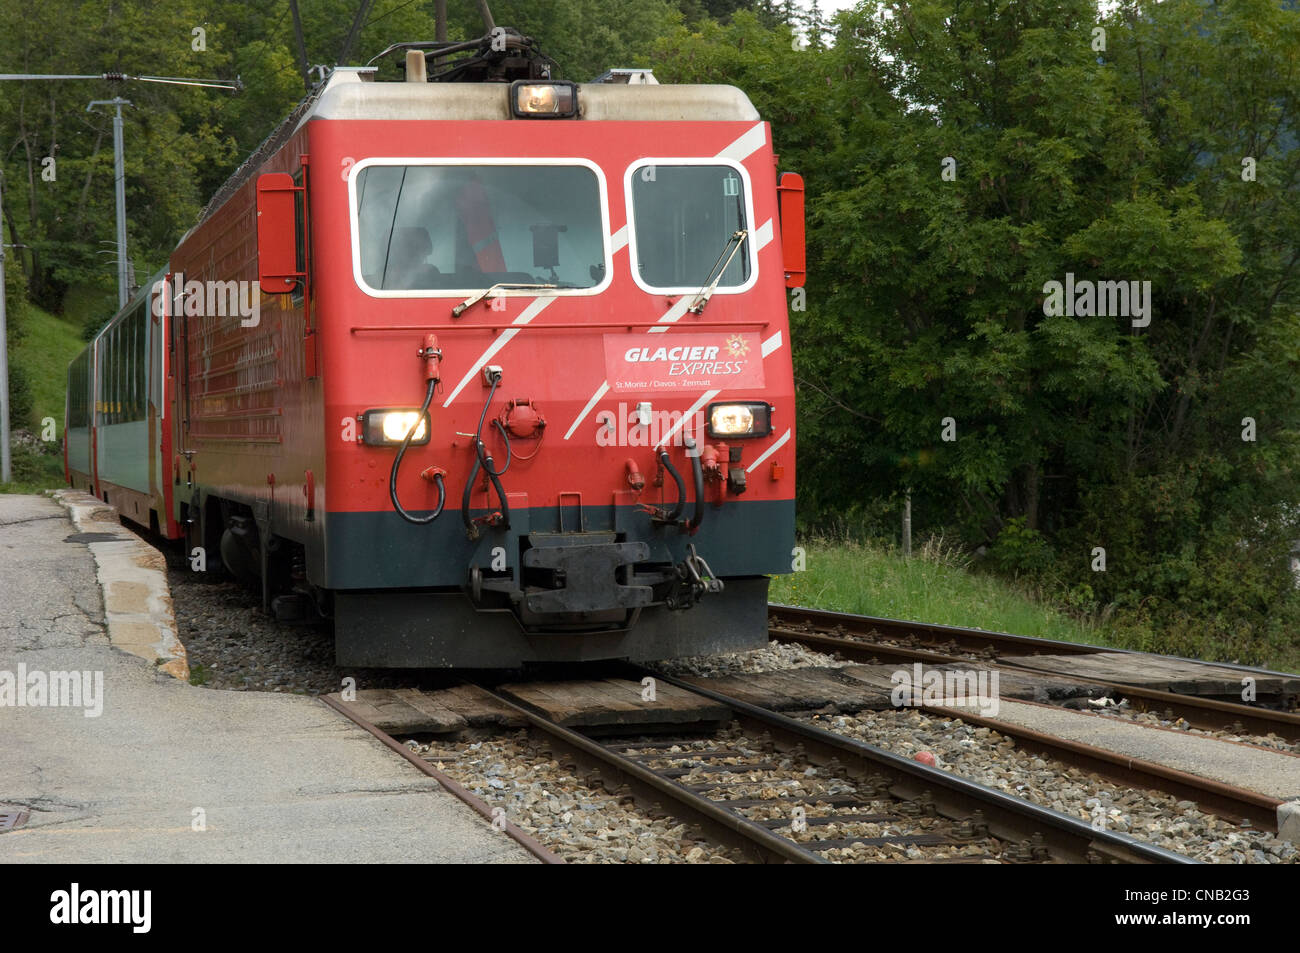 Matterhorn Gotthard Bahn Glacier Express train in Bellwald station in Canton of Valais in Switzerland - Stock Image